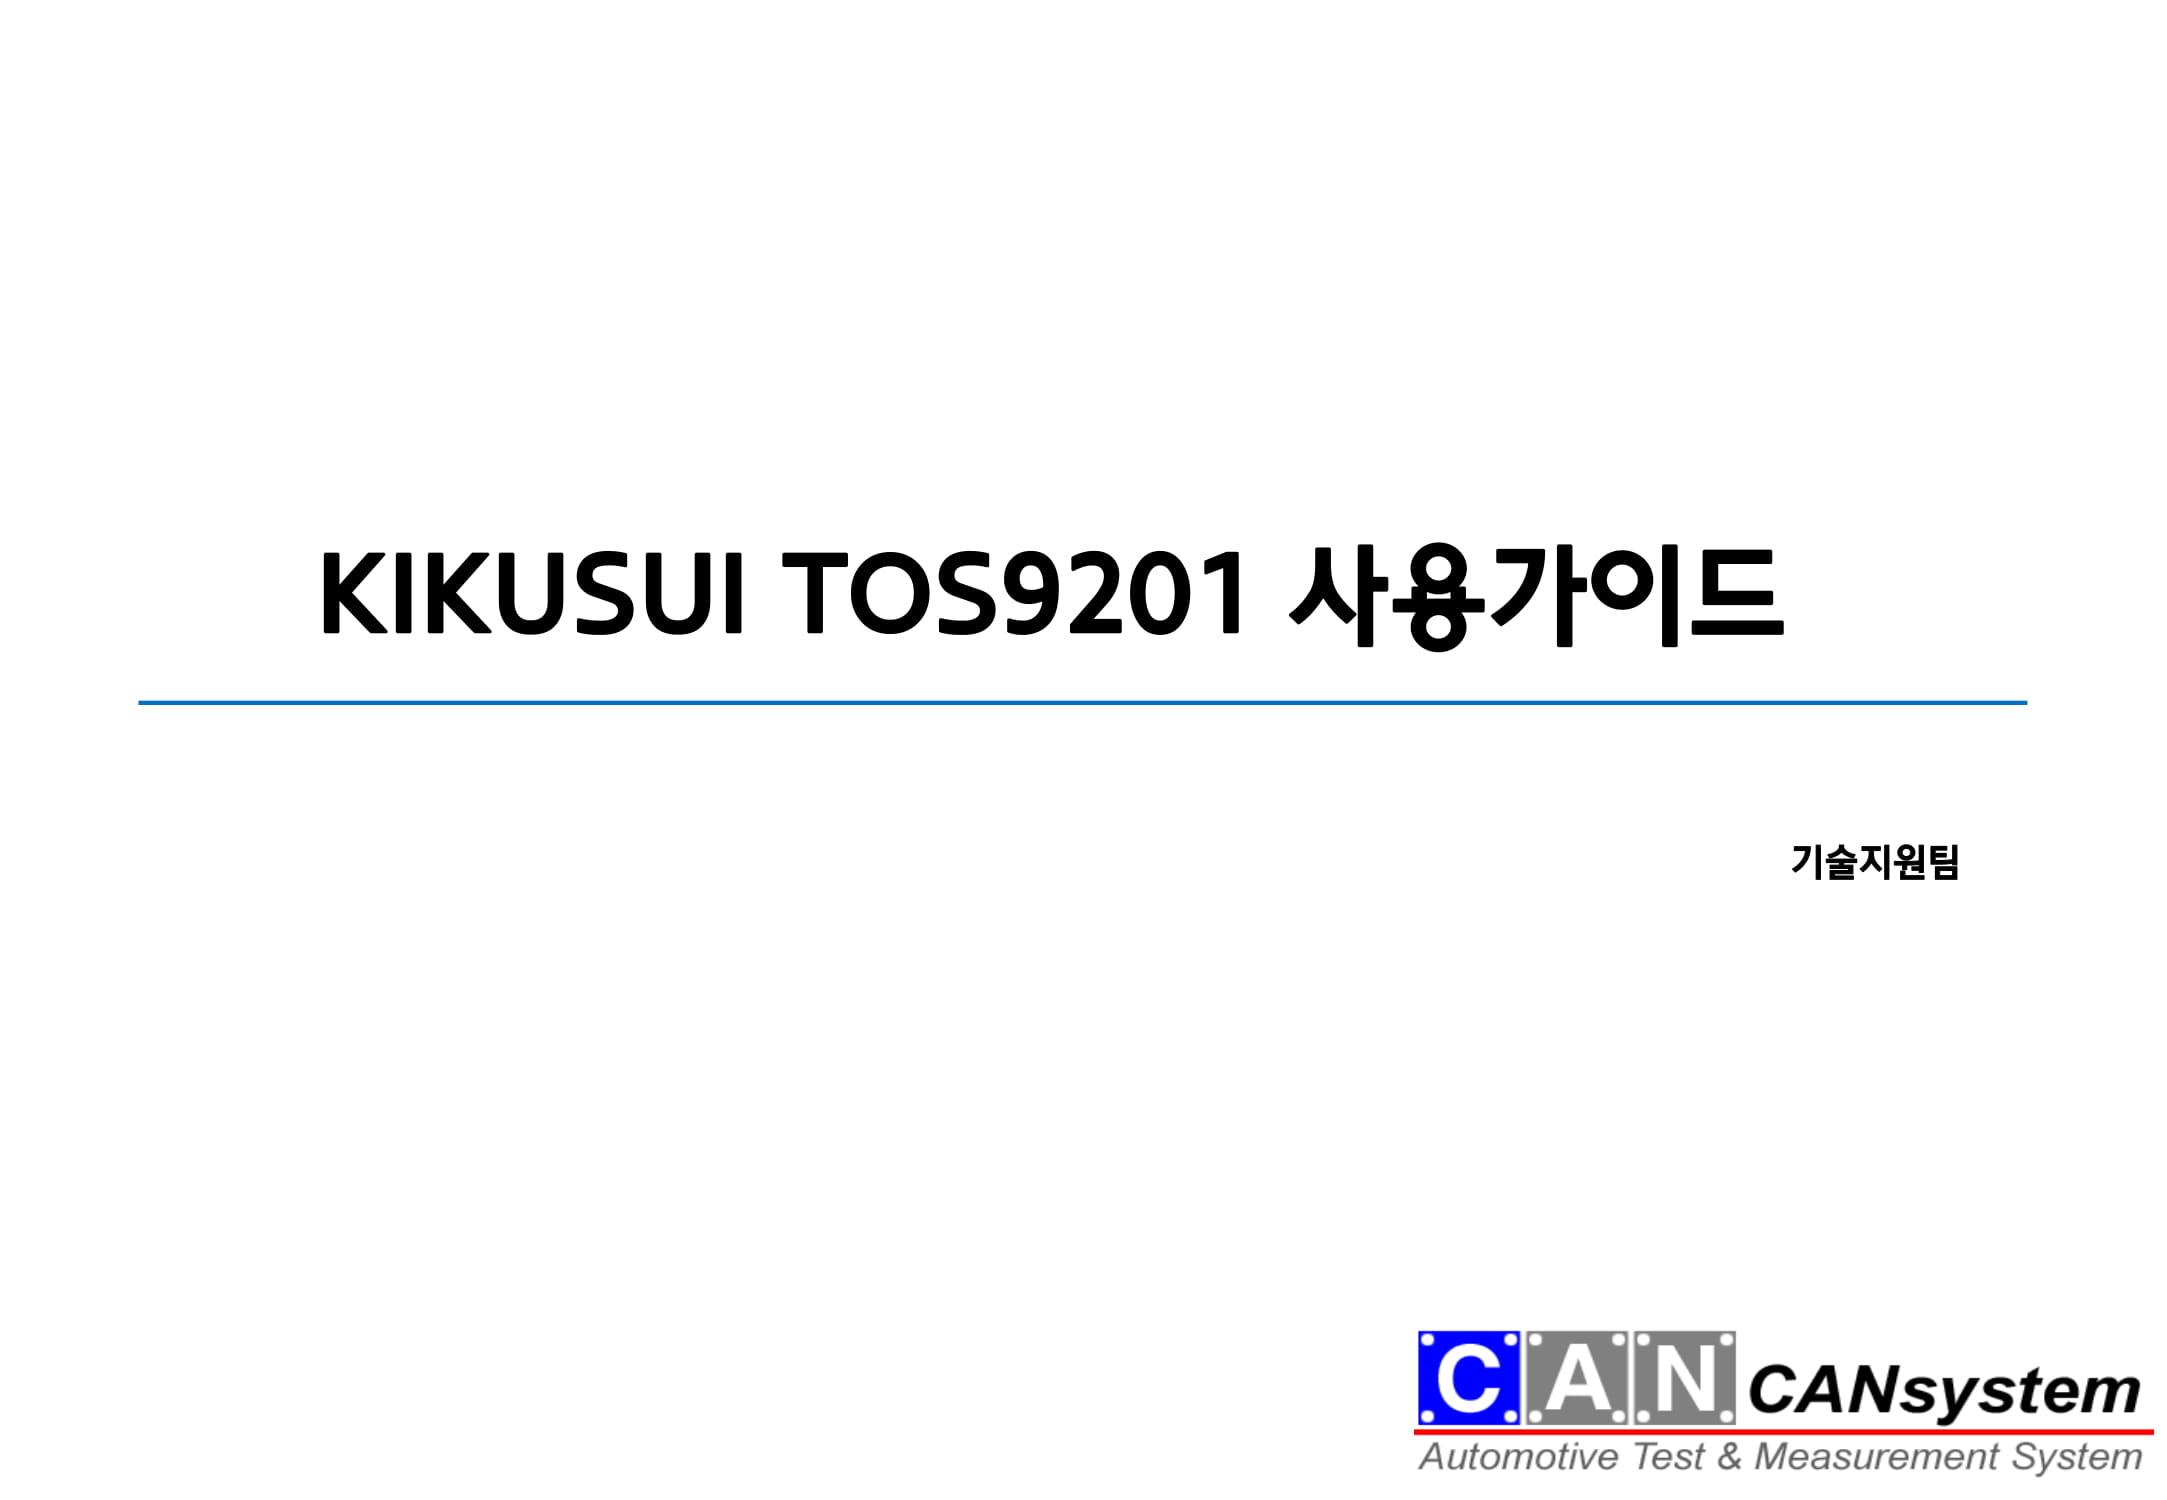 KIKUSUI TOS9201 국문 이용가이드-01.jpg